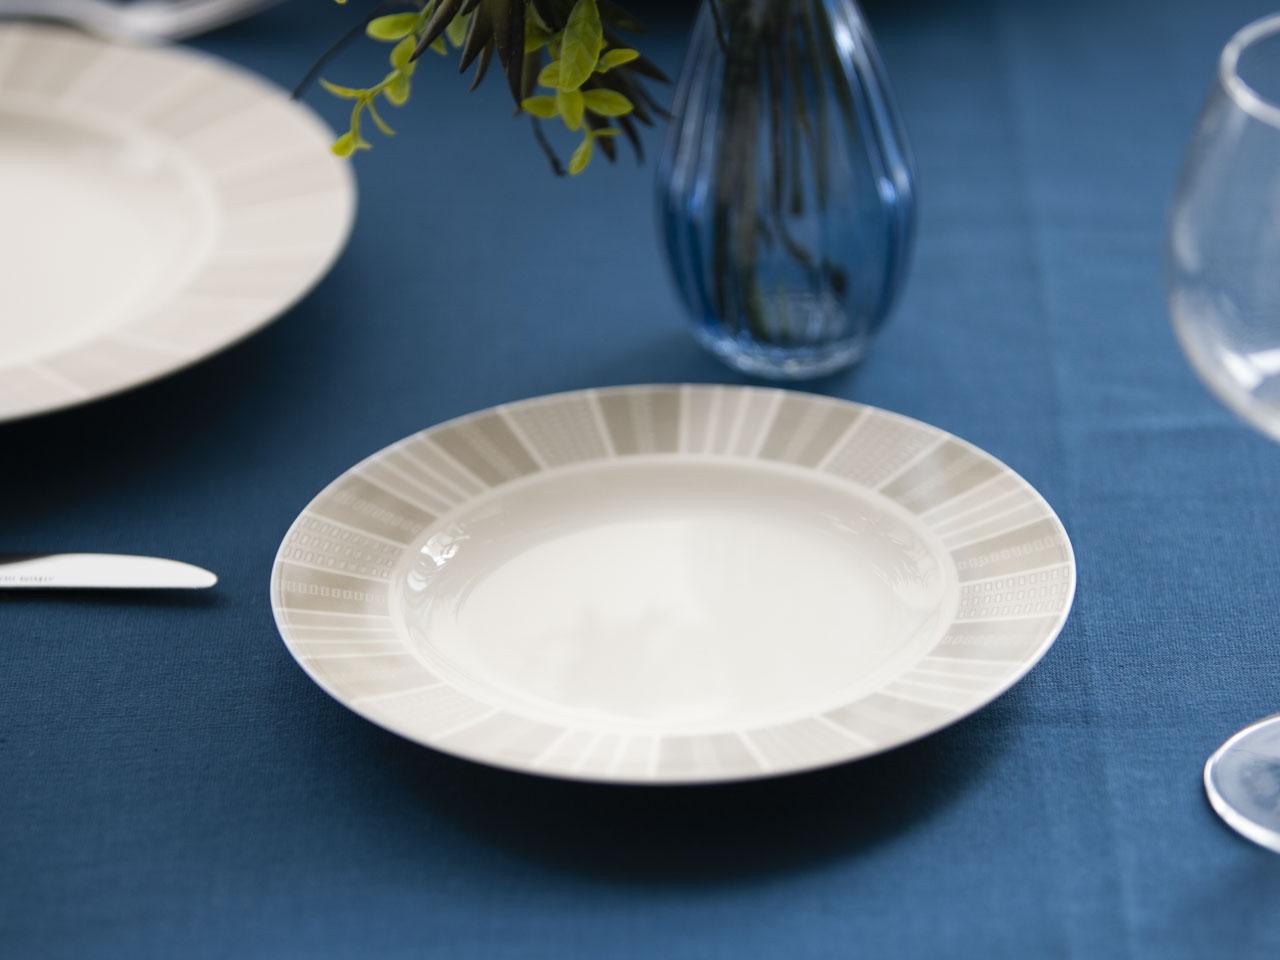 Talerz deserowy porcelana MariaPaula Ecru Alison 20 cm